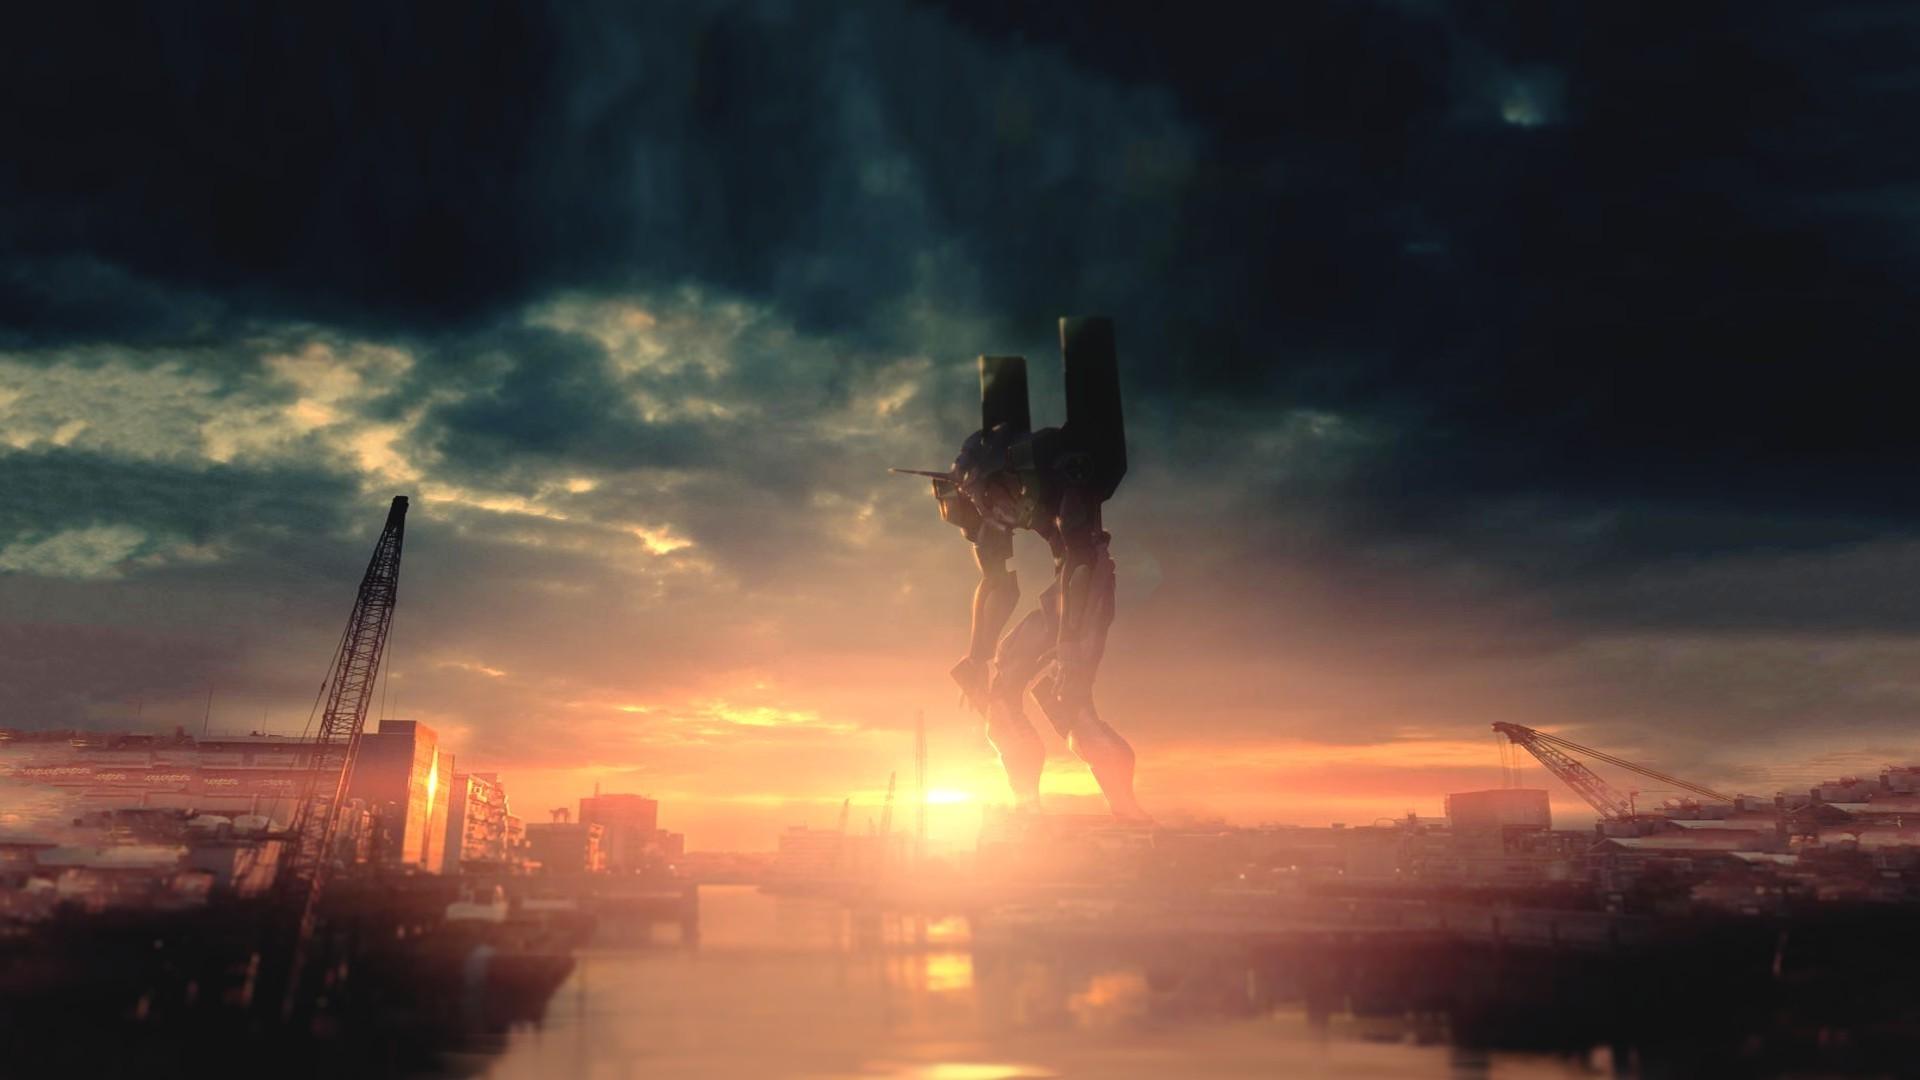 Neon Genesis Evangelion Eva Unit 01 Anime Wallpapers Evangelion Wallpaper Hd 1920x1080 Wallpaper Teahub Io